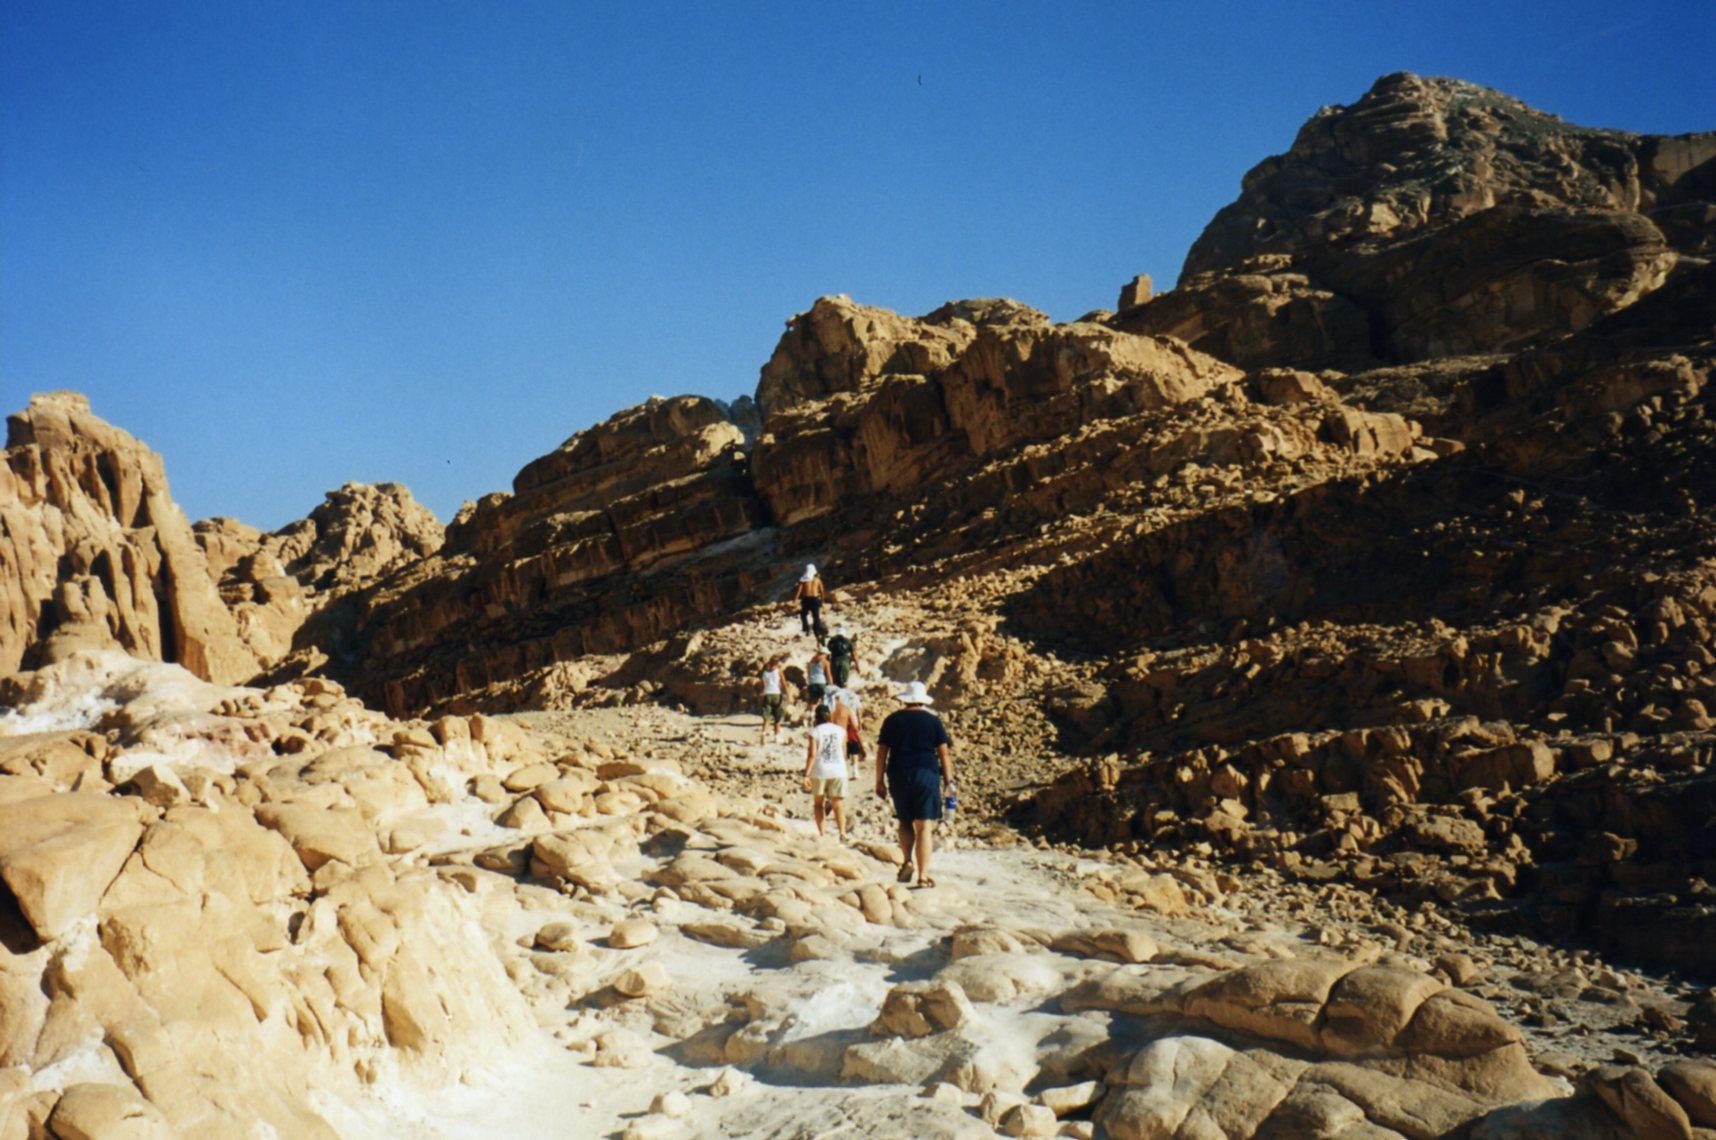 Walking to the White Canyon